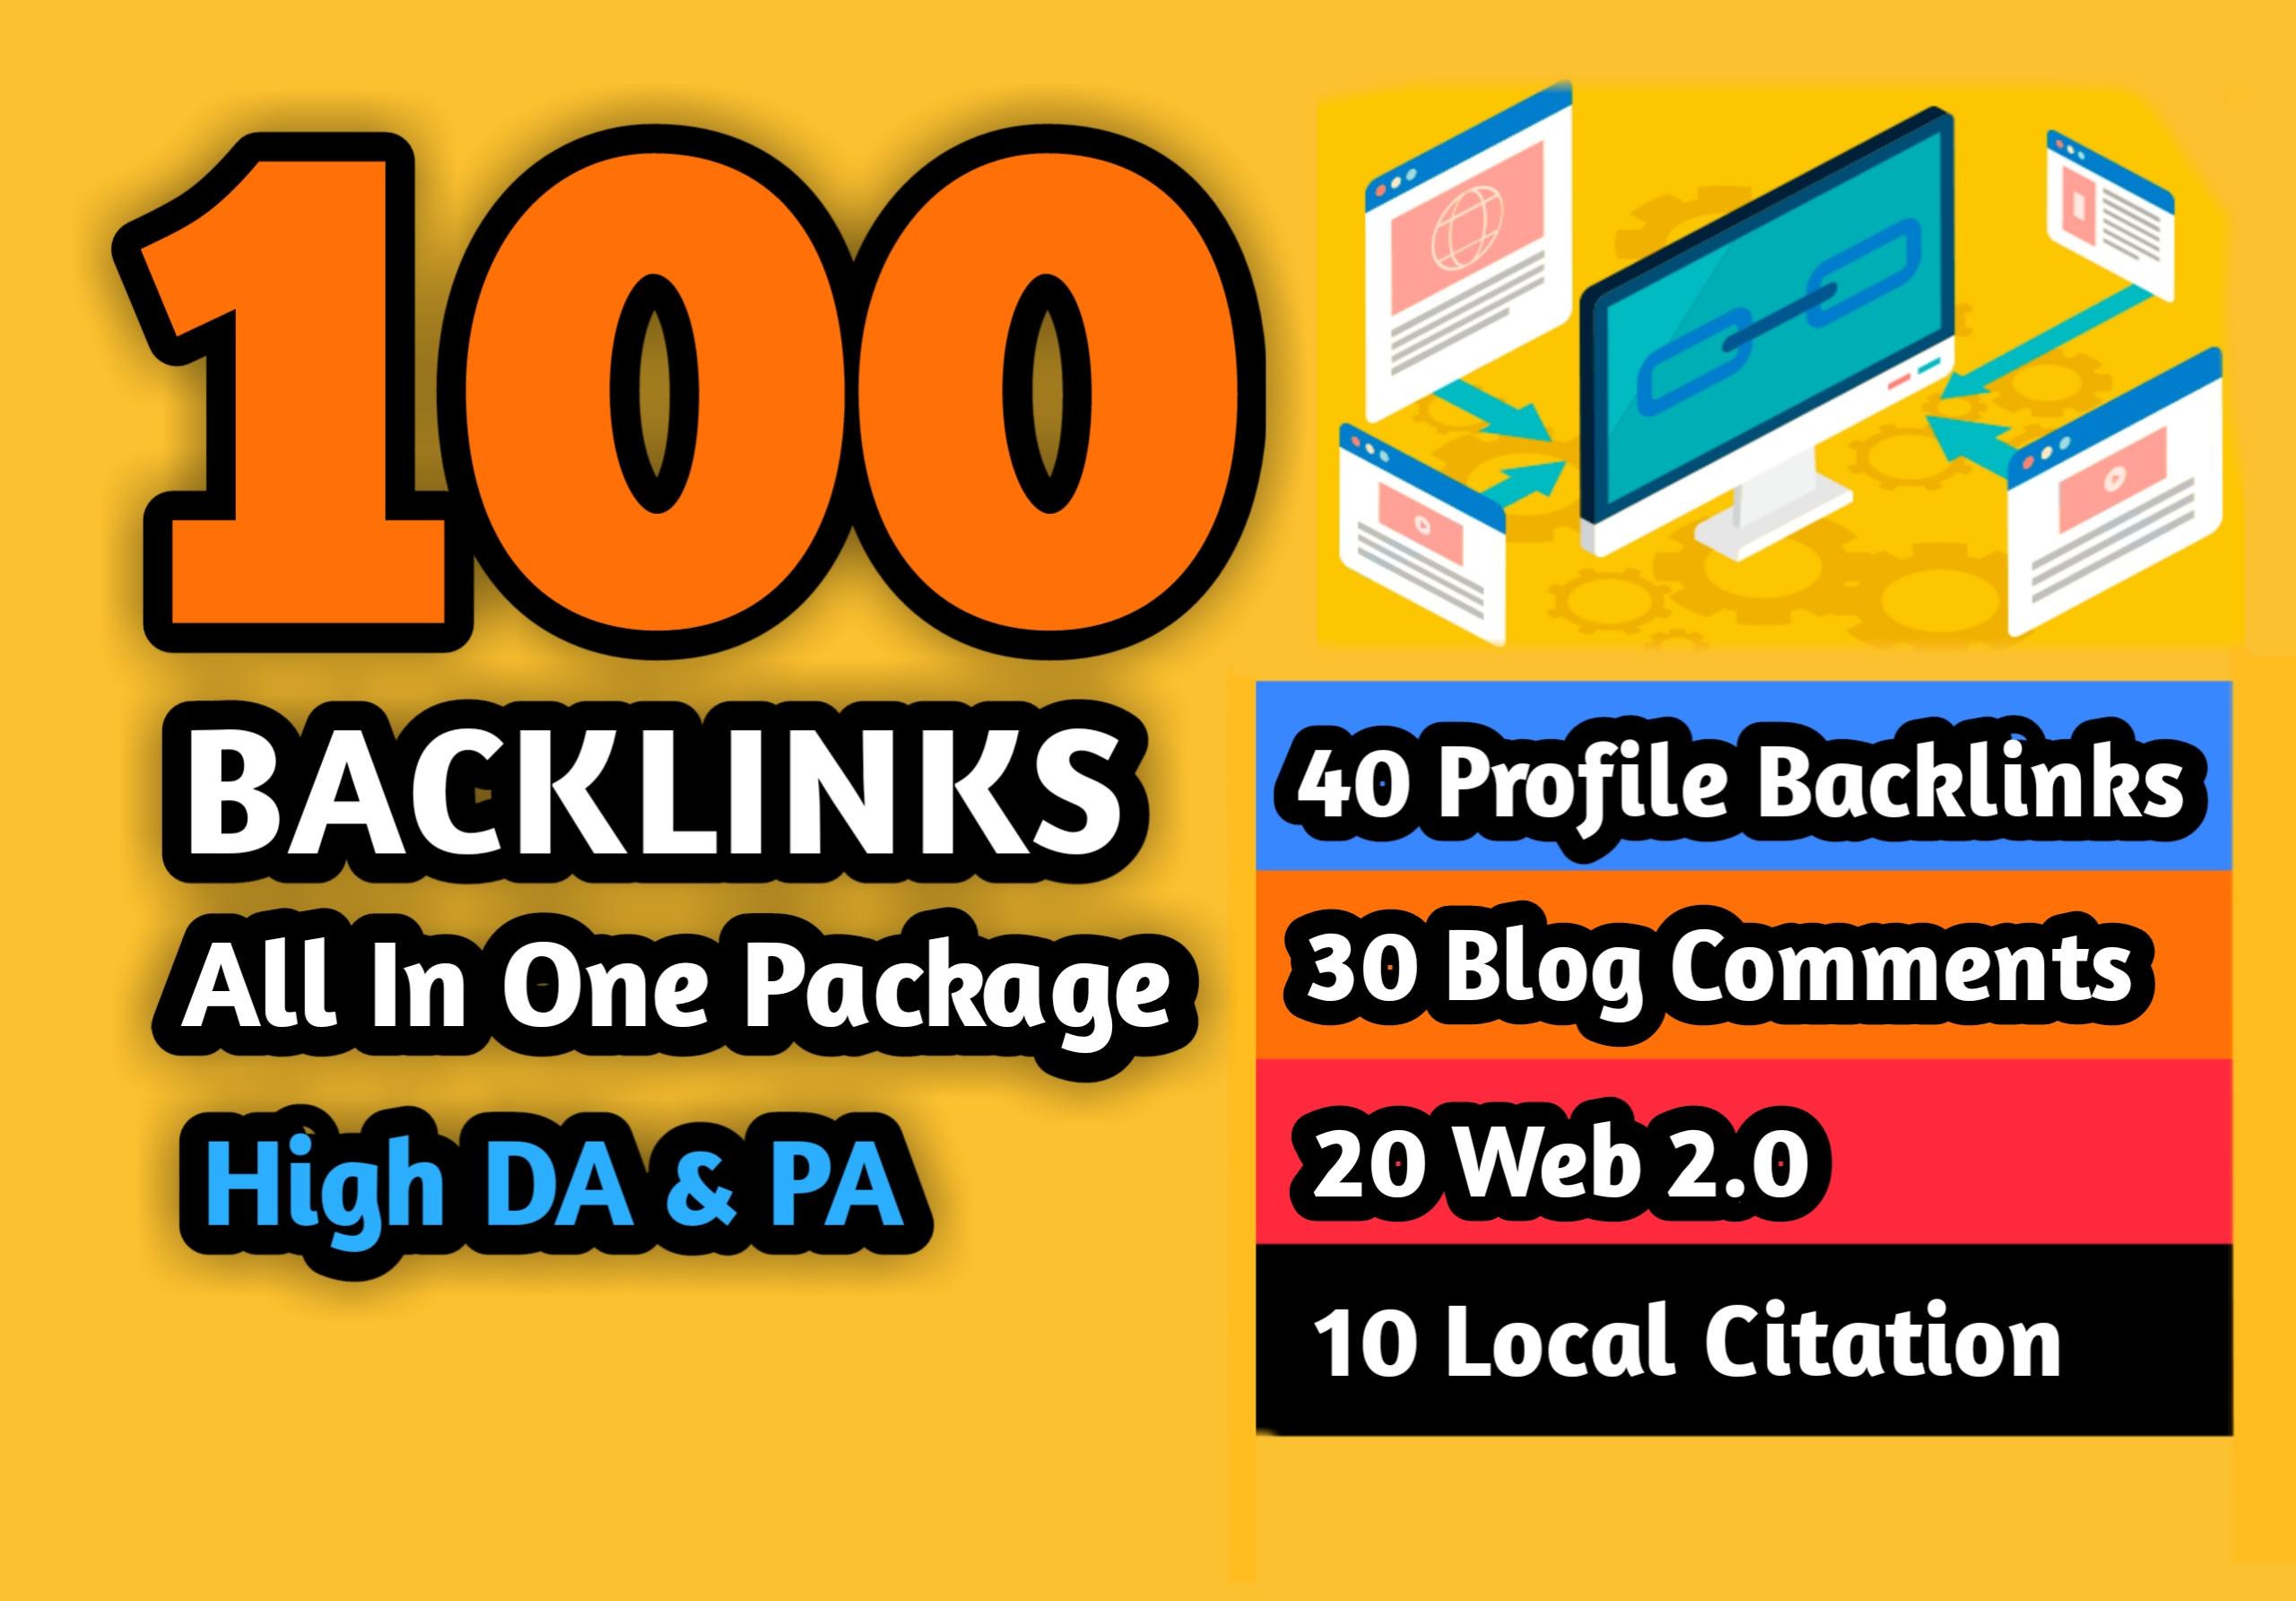 40 Profile Backlinks,  30 Blog Comments,  20 Web 2.0 & 10 Local Citation